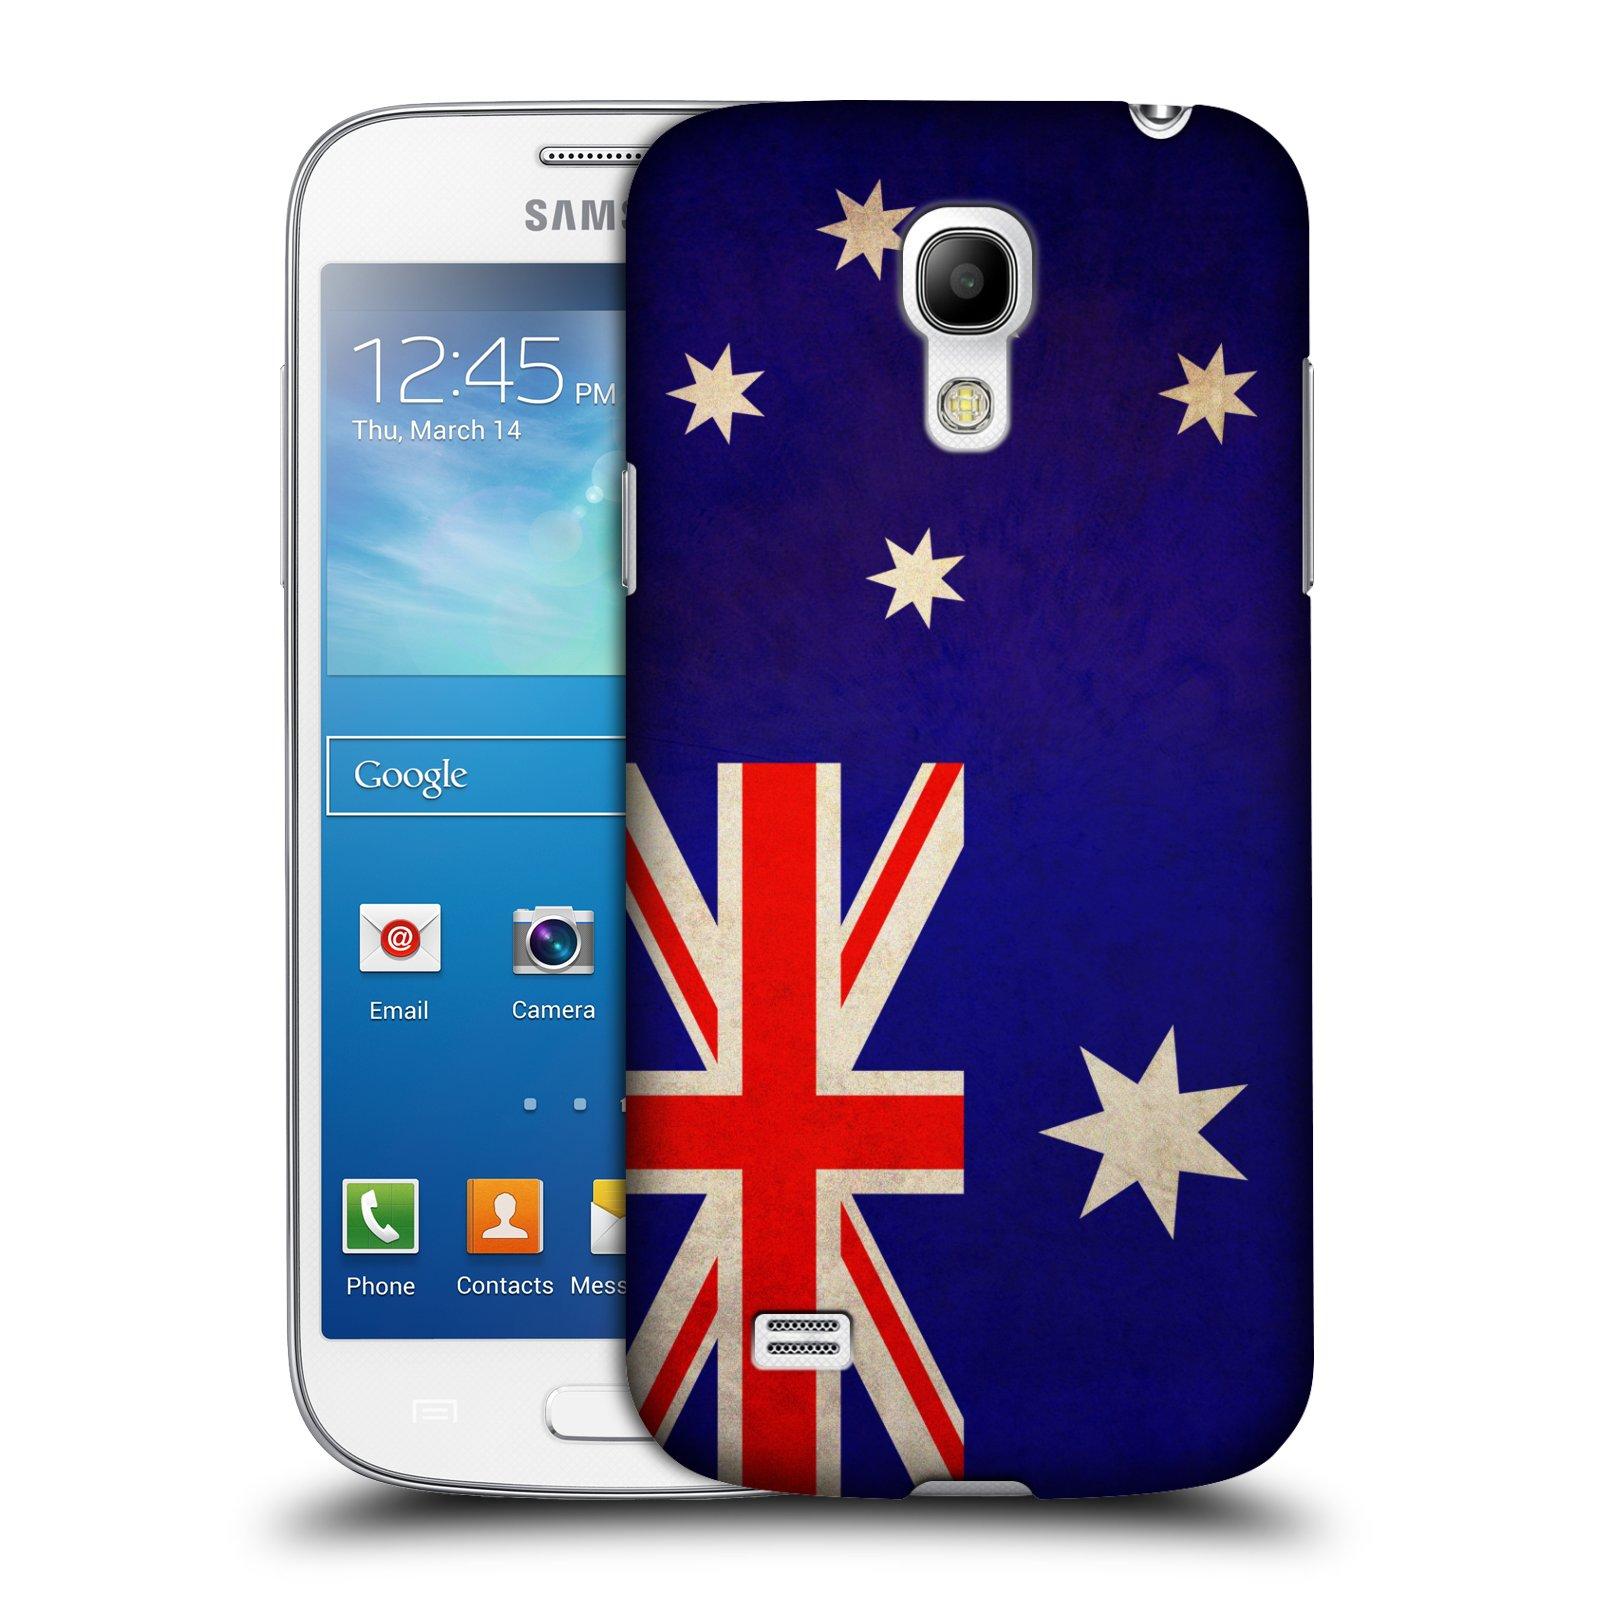 Plastové pouzdro na mobil Samsung Galaxy S4 Mini HEAD CASE VLAJKA AUSTRÁLIE (Kryt či obal na mobilní telefon Samsung Galaxy S4 Mini GT-i9195 / i9190)